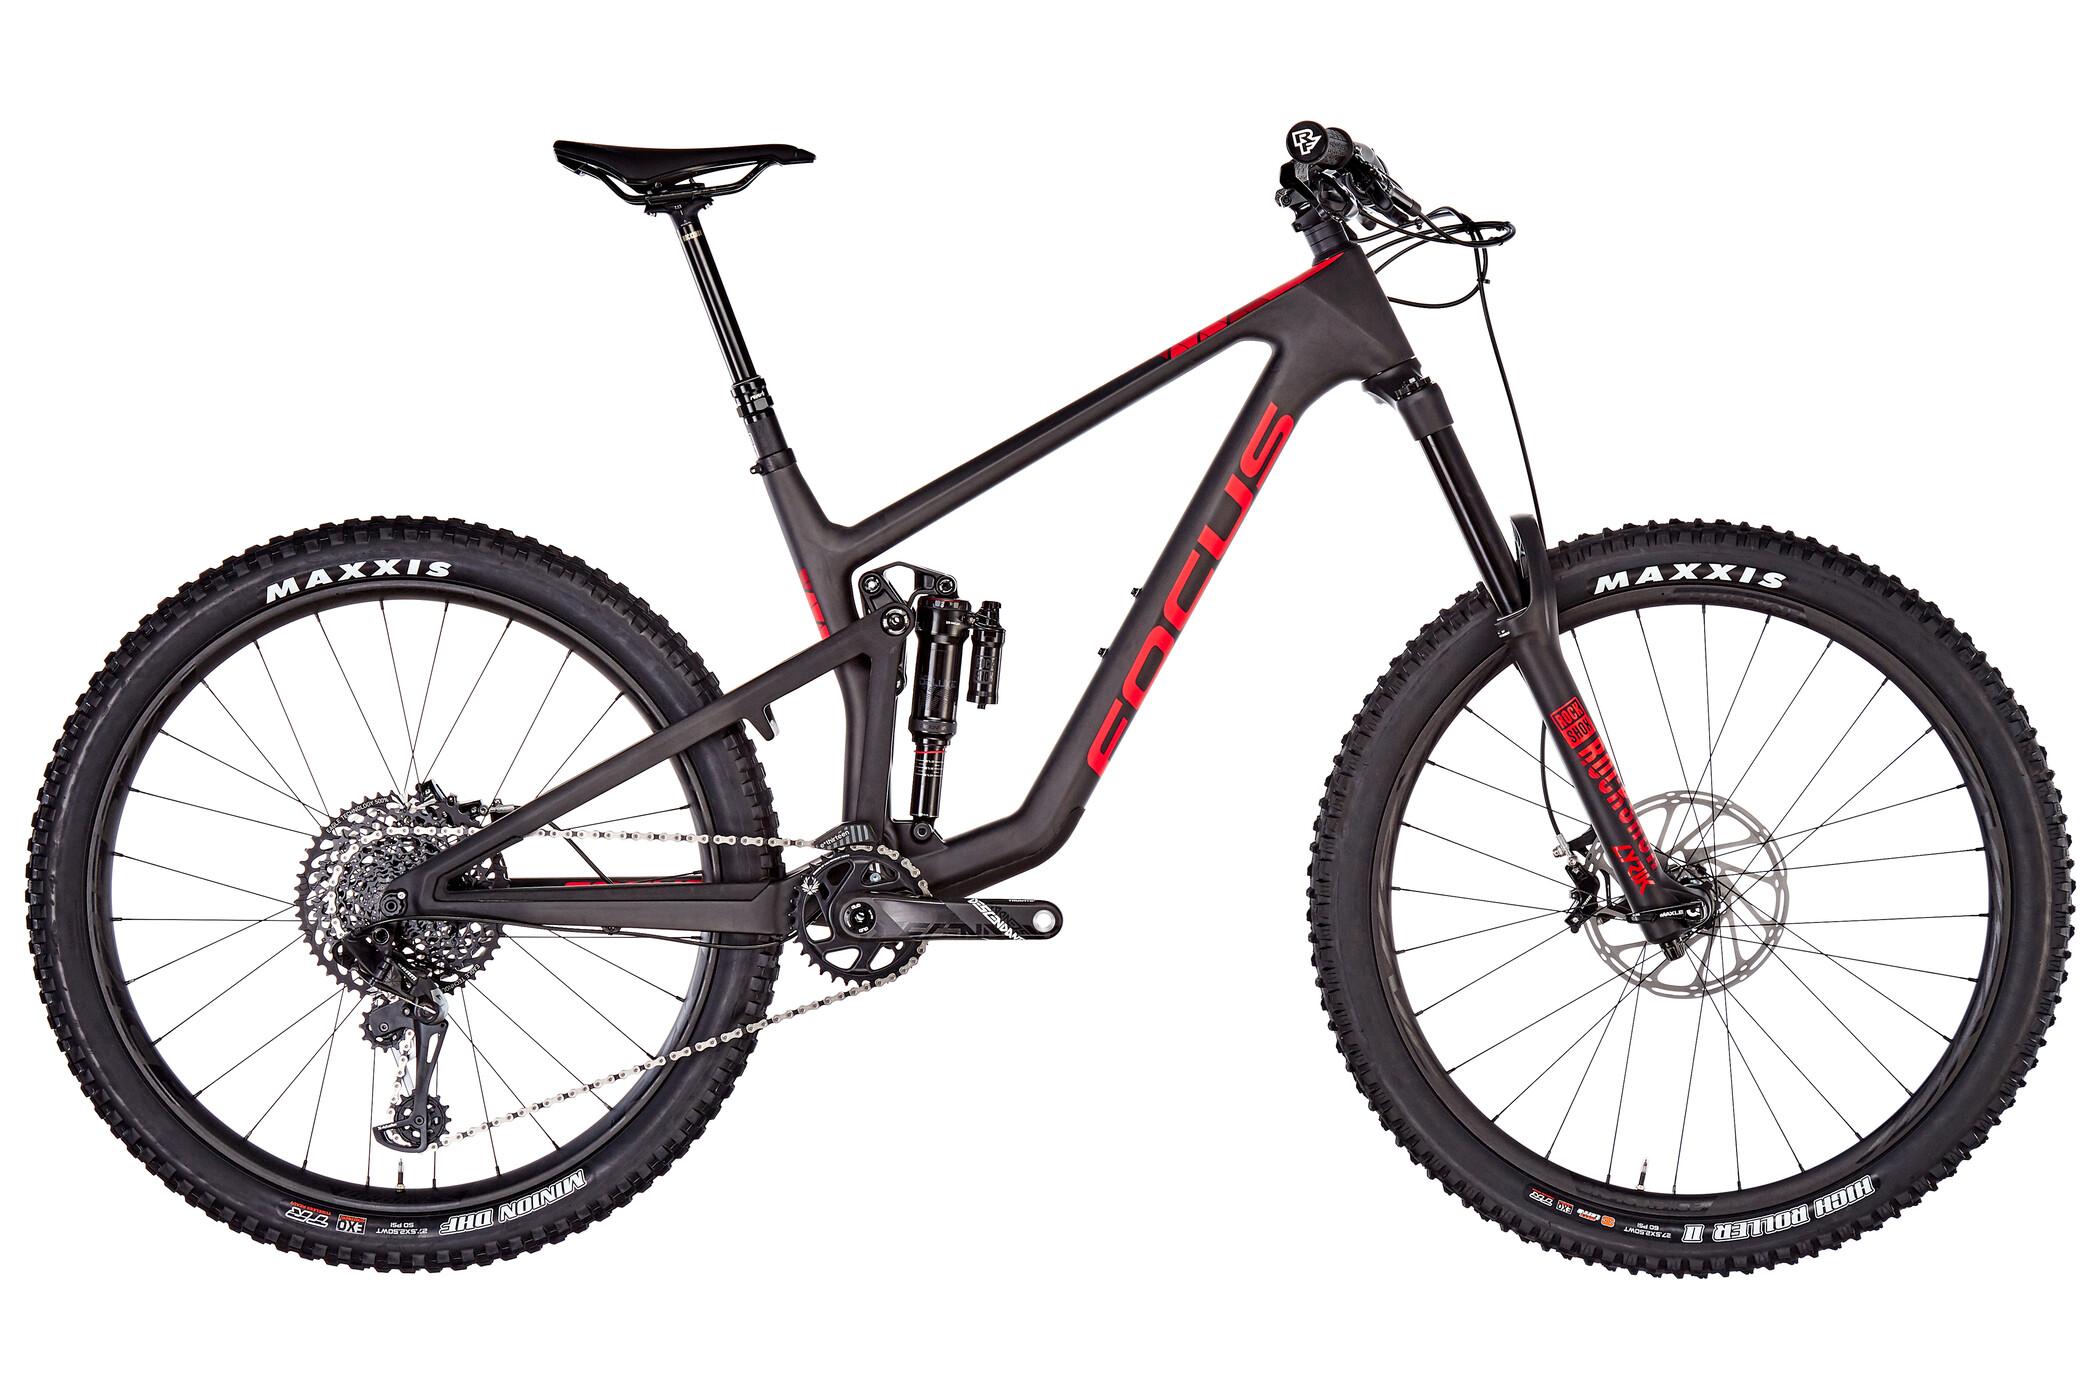 FOCUS Sam 9.9, black/red (2019) | Mountainbikes